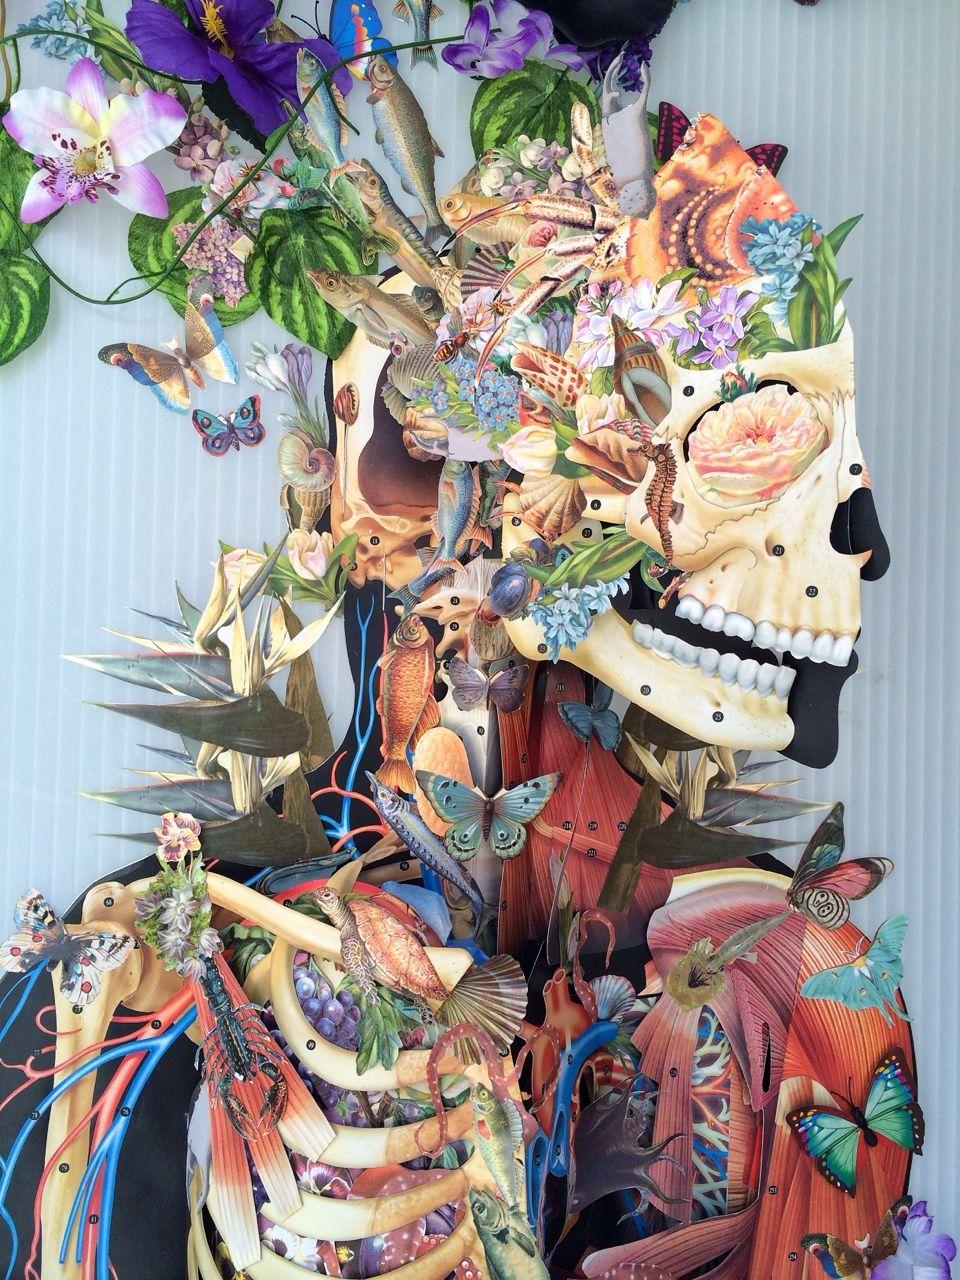 Bedelgeuse | Skull&flowers. | Pinterest | Anatomía, Medicina y ...